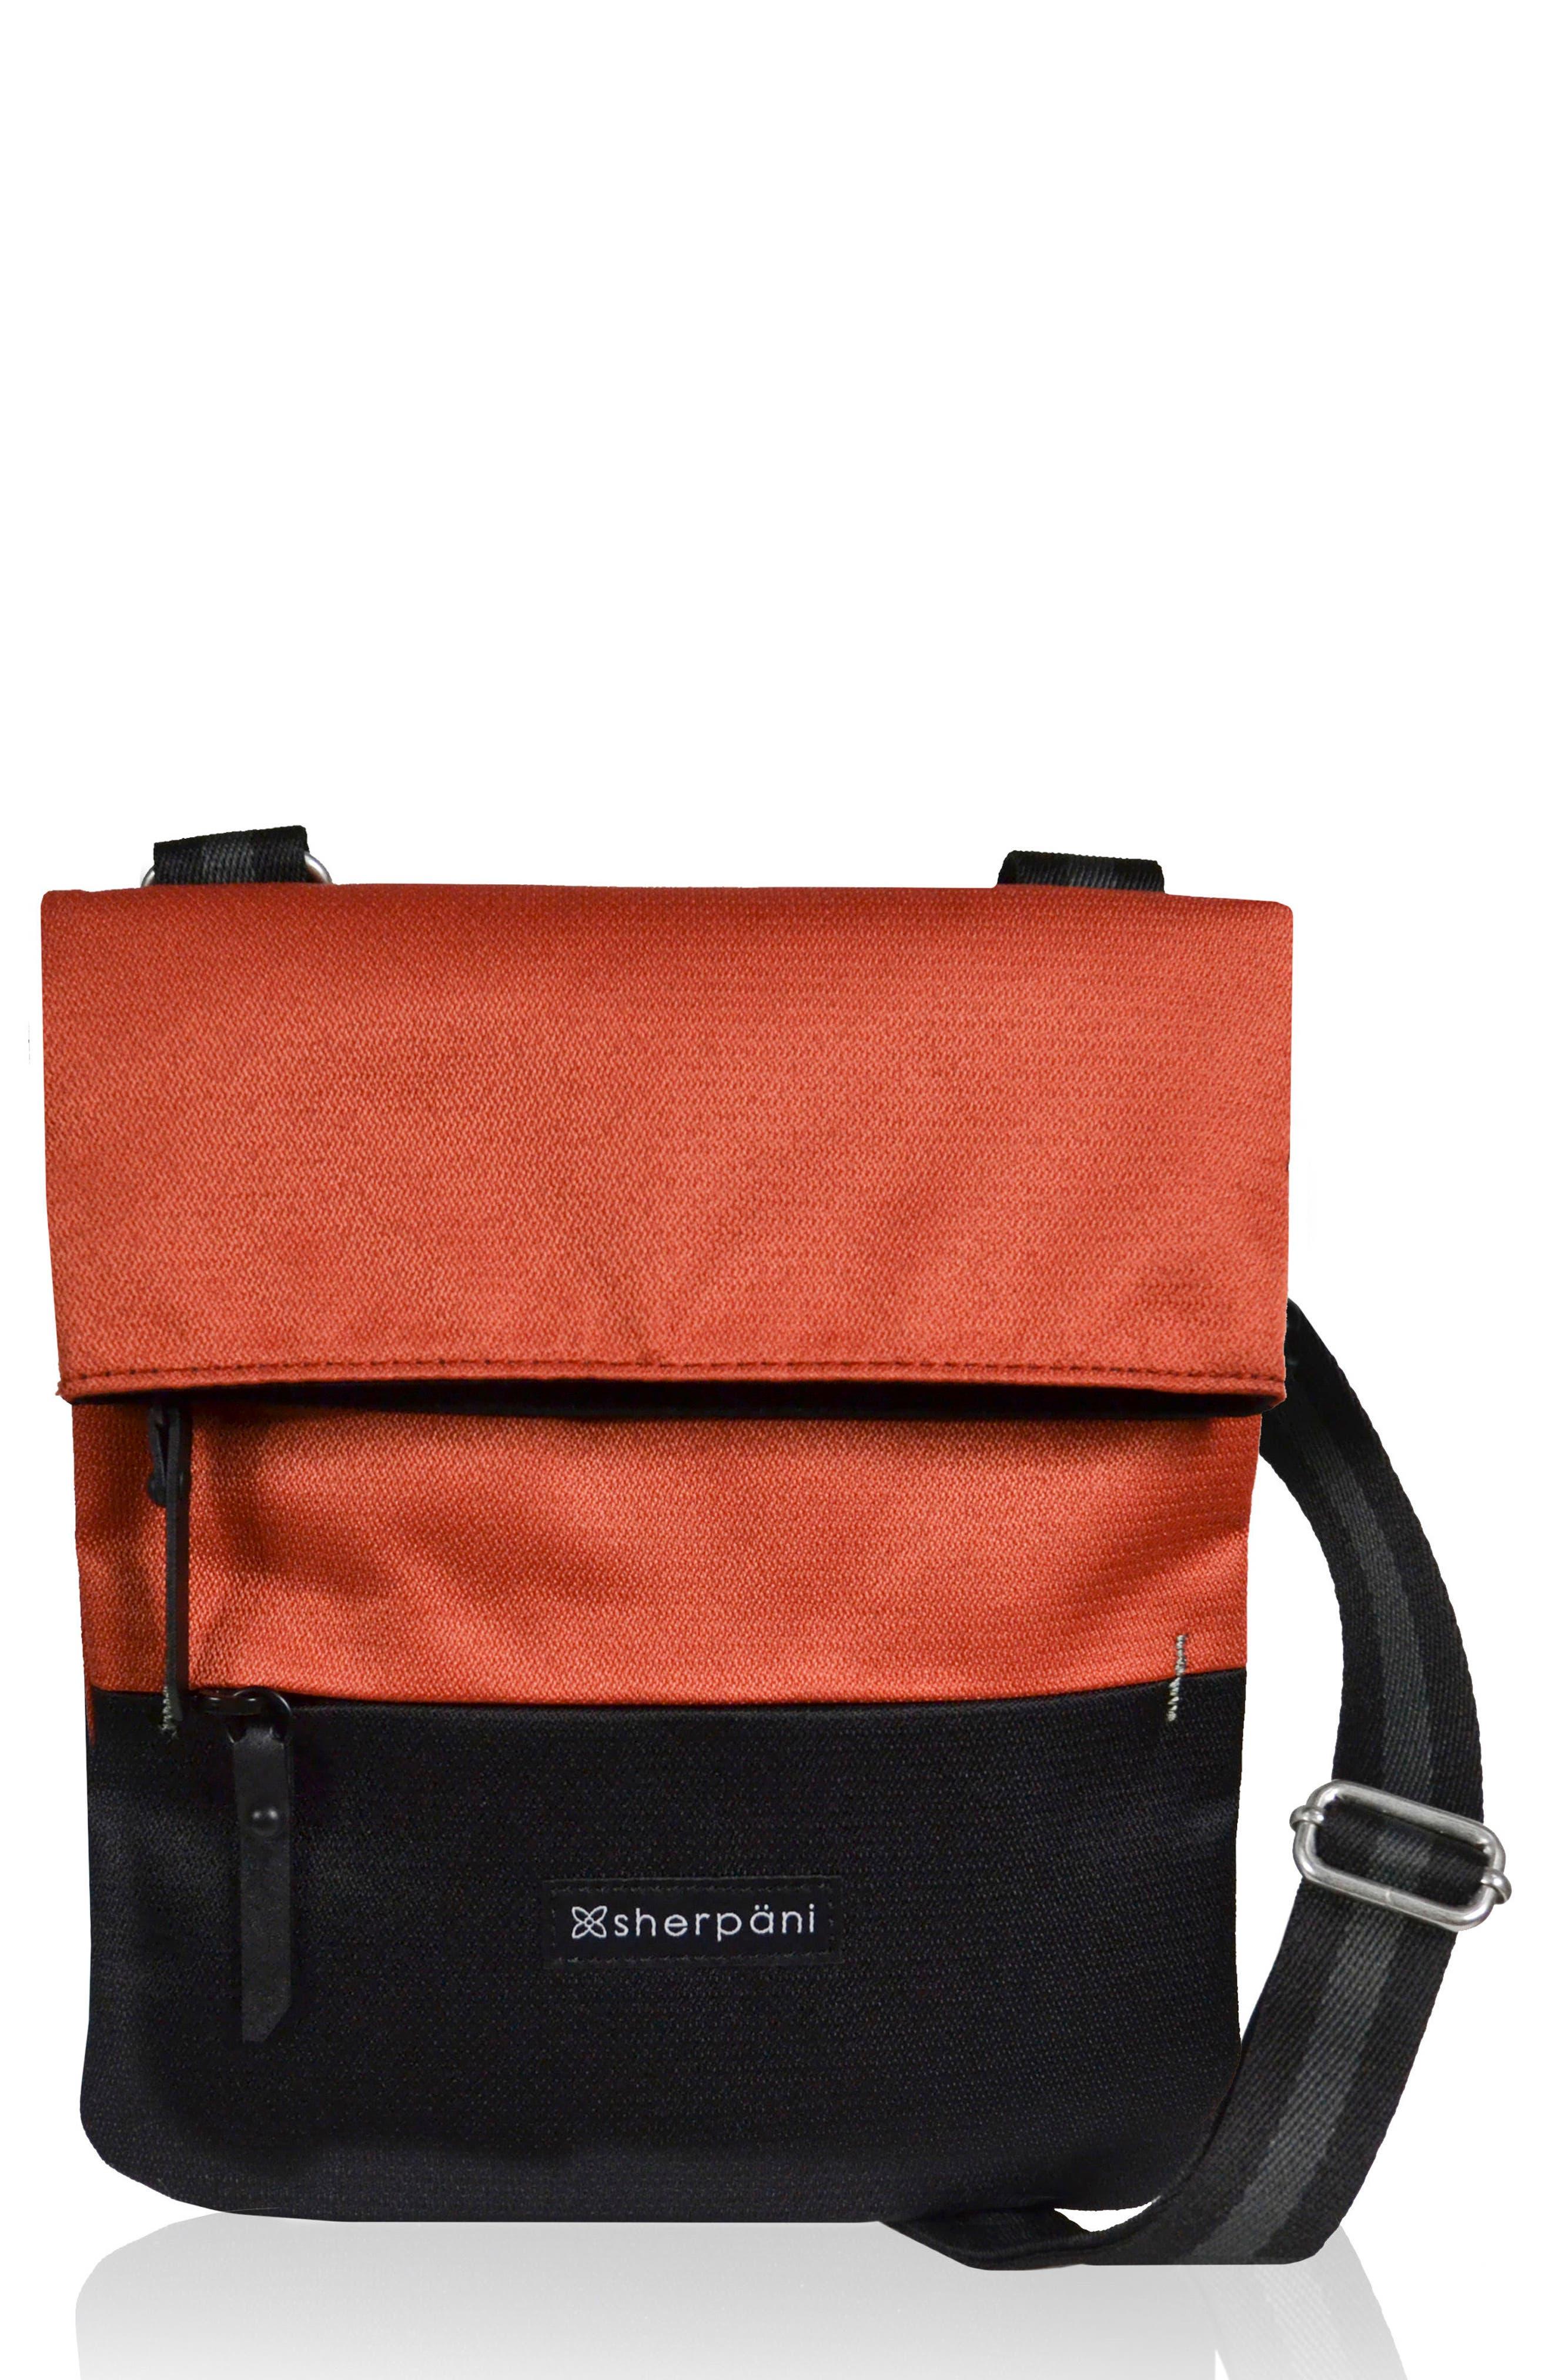 Sherpani Small Pica Crossbody Bag